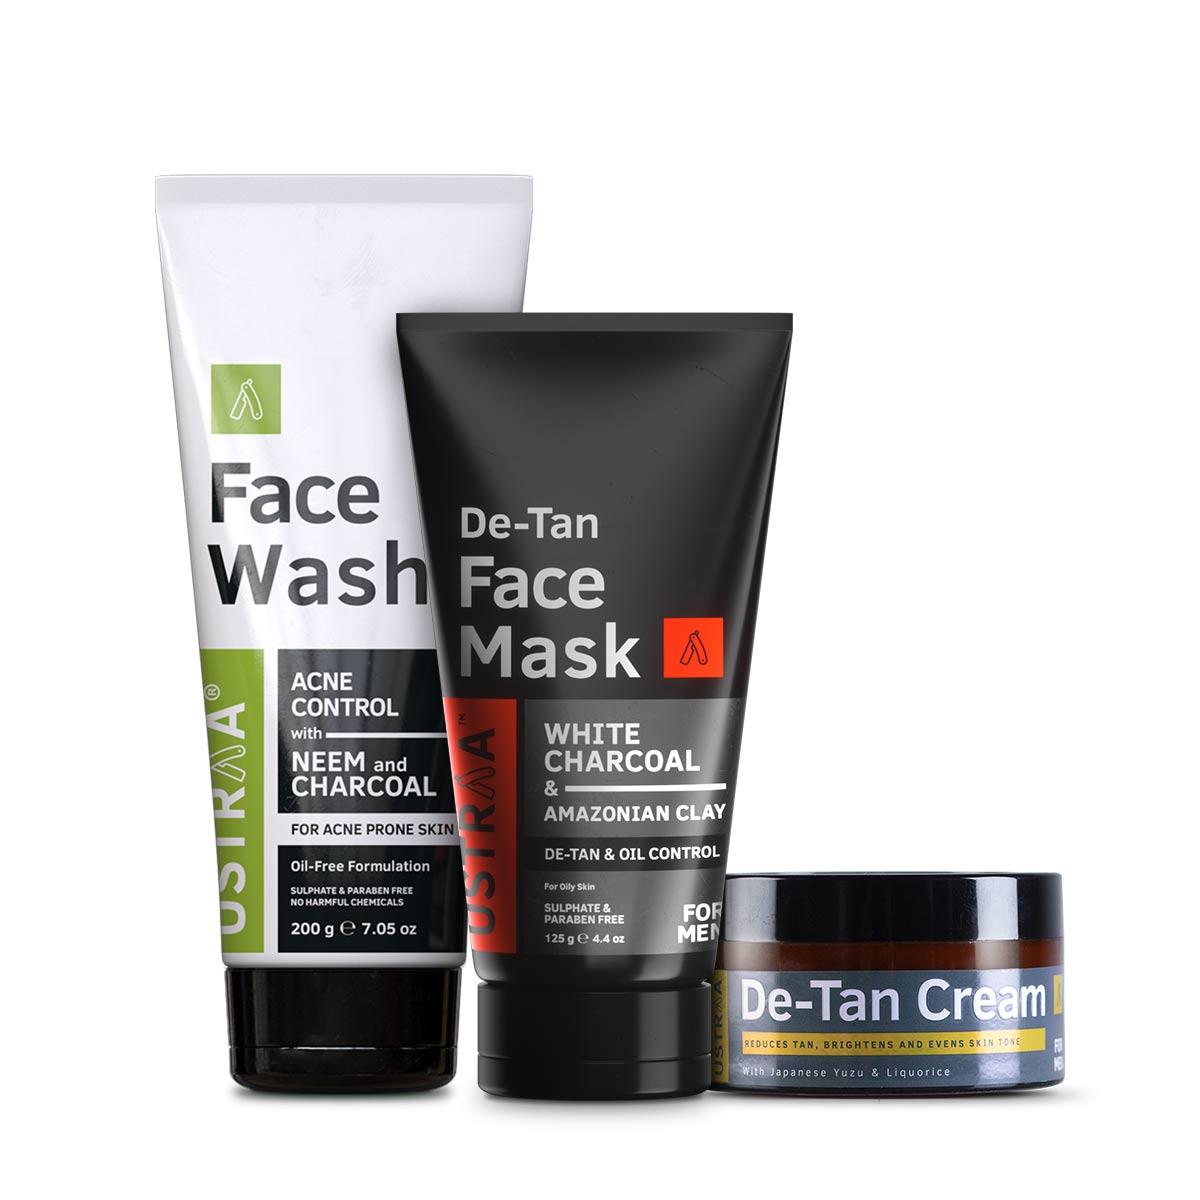 Ustraa | Ustraa Face Wash- Neem & Charcoal 200 g , De Tan Cream 50 g & Face Mask Oily Skin 125 g